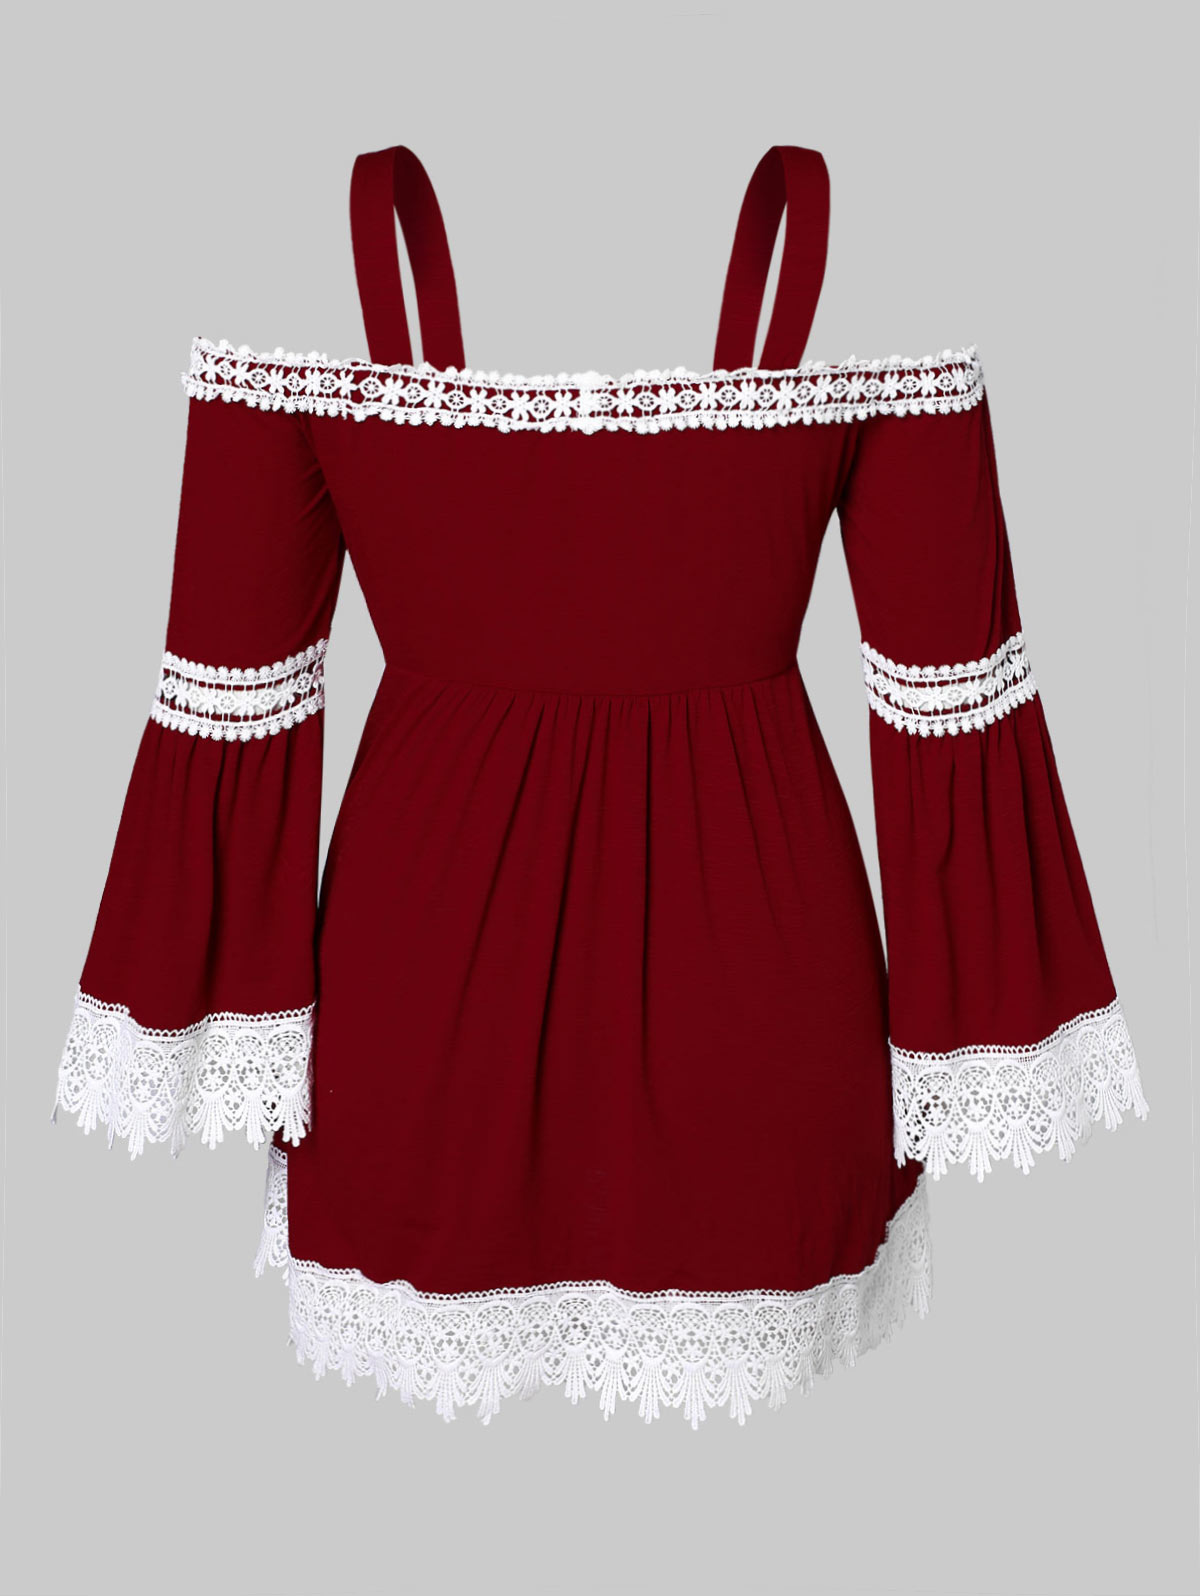 Manga Tamaño Blusa Top Del Correa Patchwork Hem Primavera Plus Camisetas Casuales Red Verano Bowknot Wipalo Wine Blusas Mujer Espaguetis AwER88